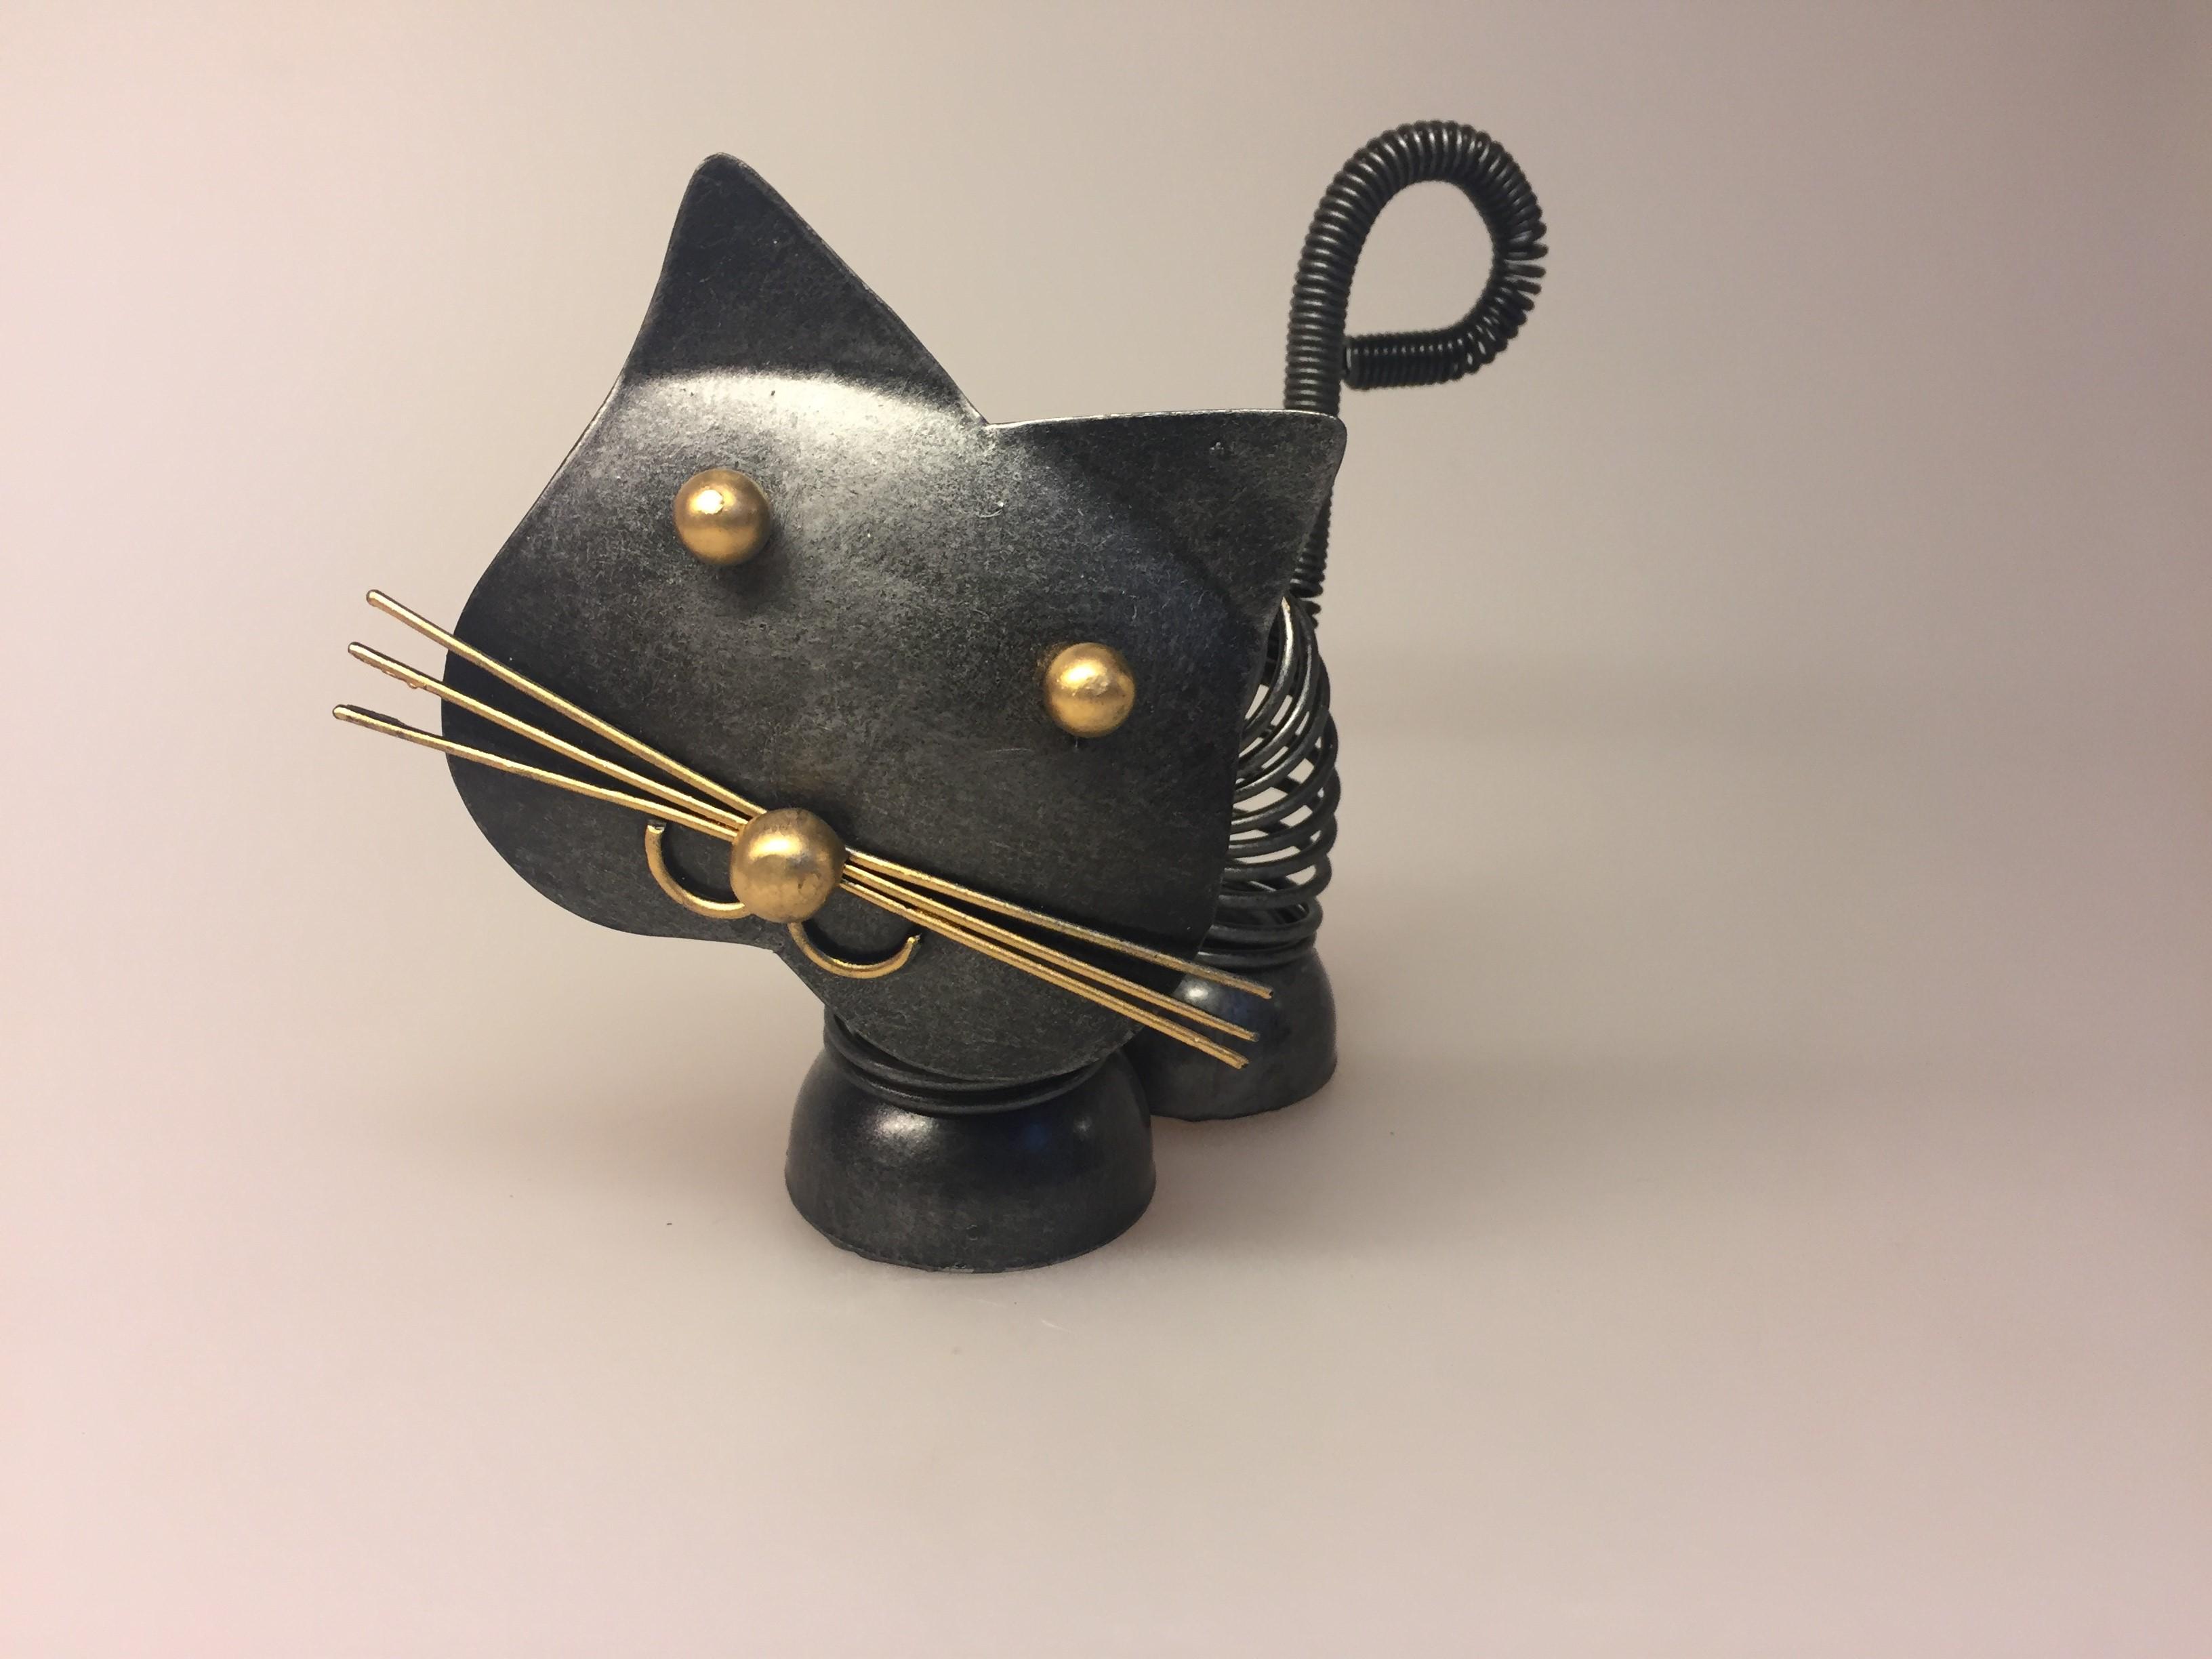 Metalfigur - Sort kat fjeder, metalkat, kattefigur, kat, missekat, mis, sort kat, penge, pengegave, penge i gave, memo, noter, ting med katte, katteting, biti, ribe